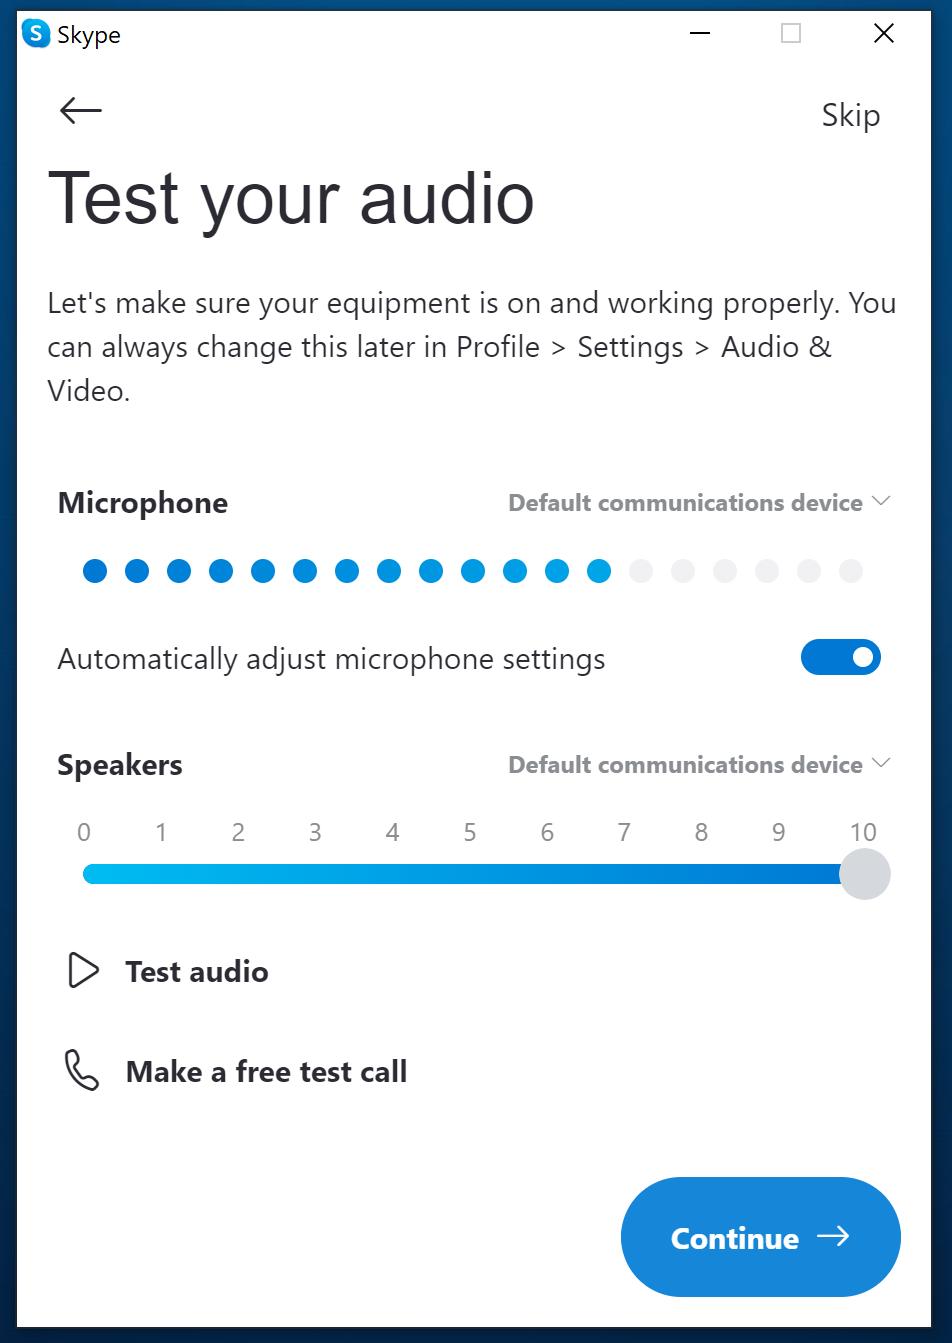 Skype audio